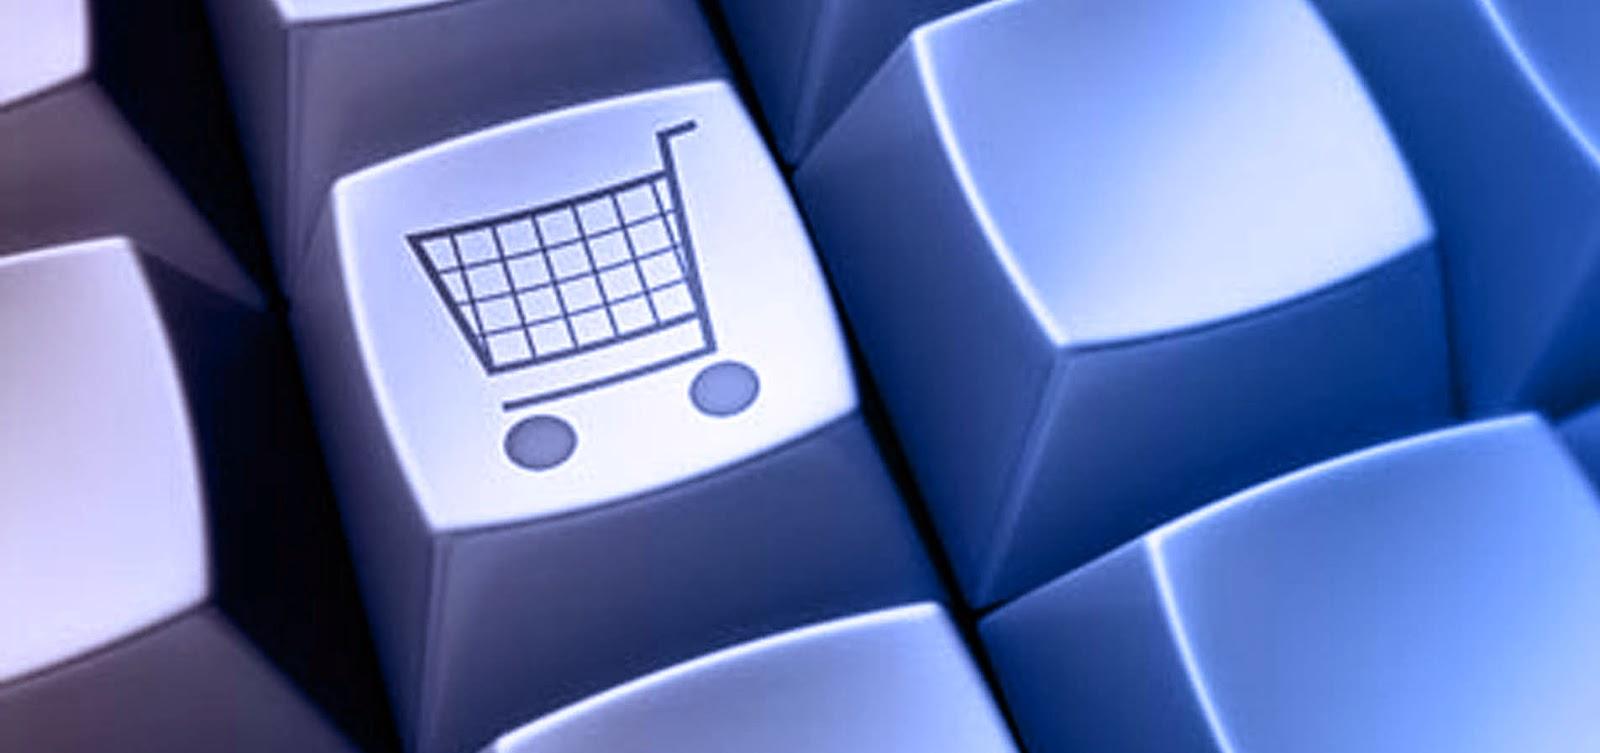 Mengenal Sekilas Tentang Bisnis Online